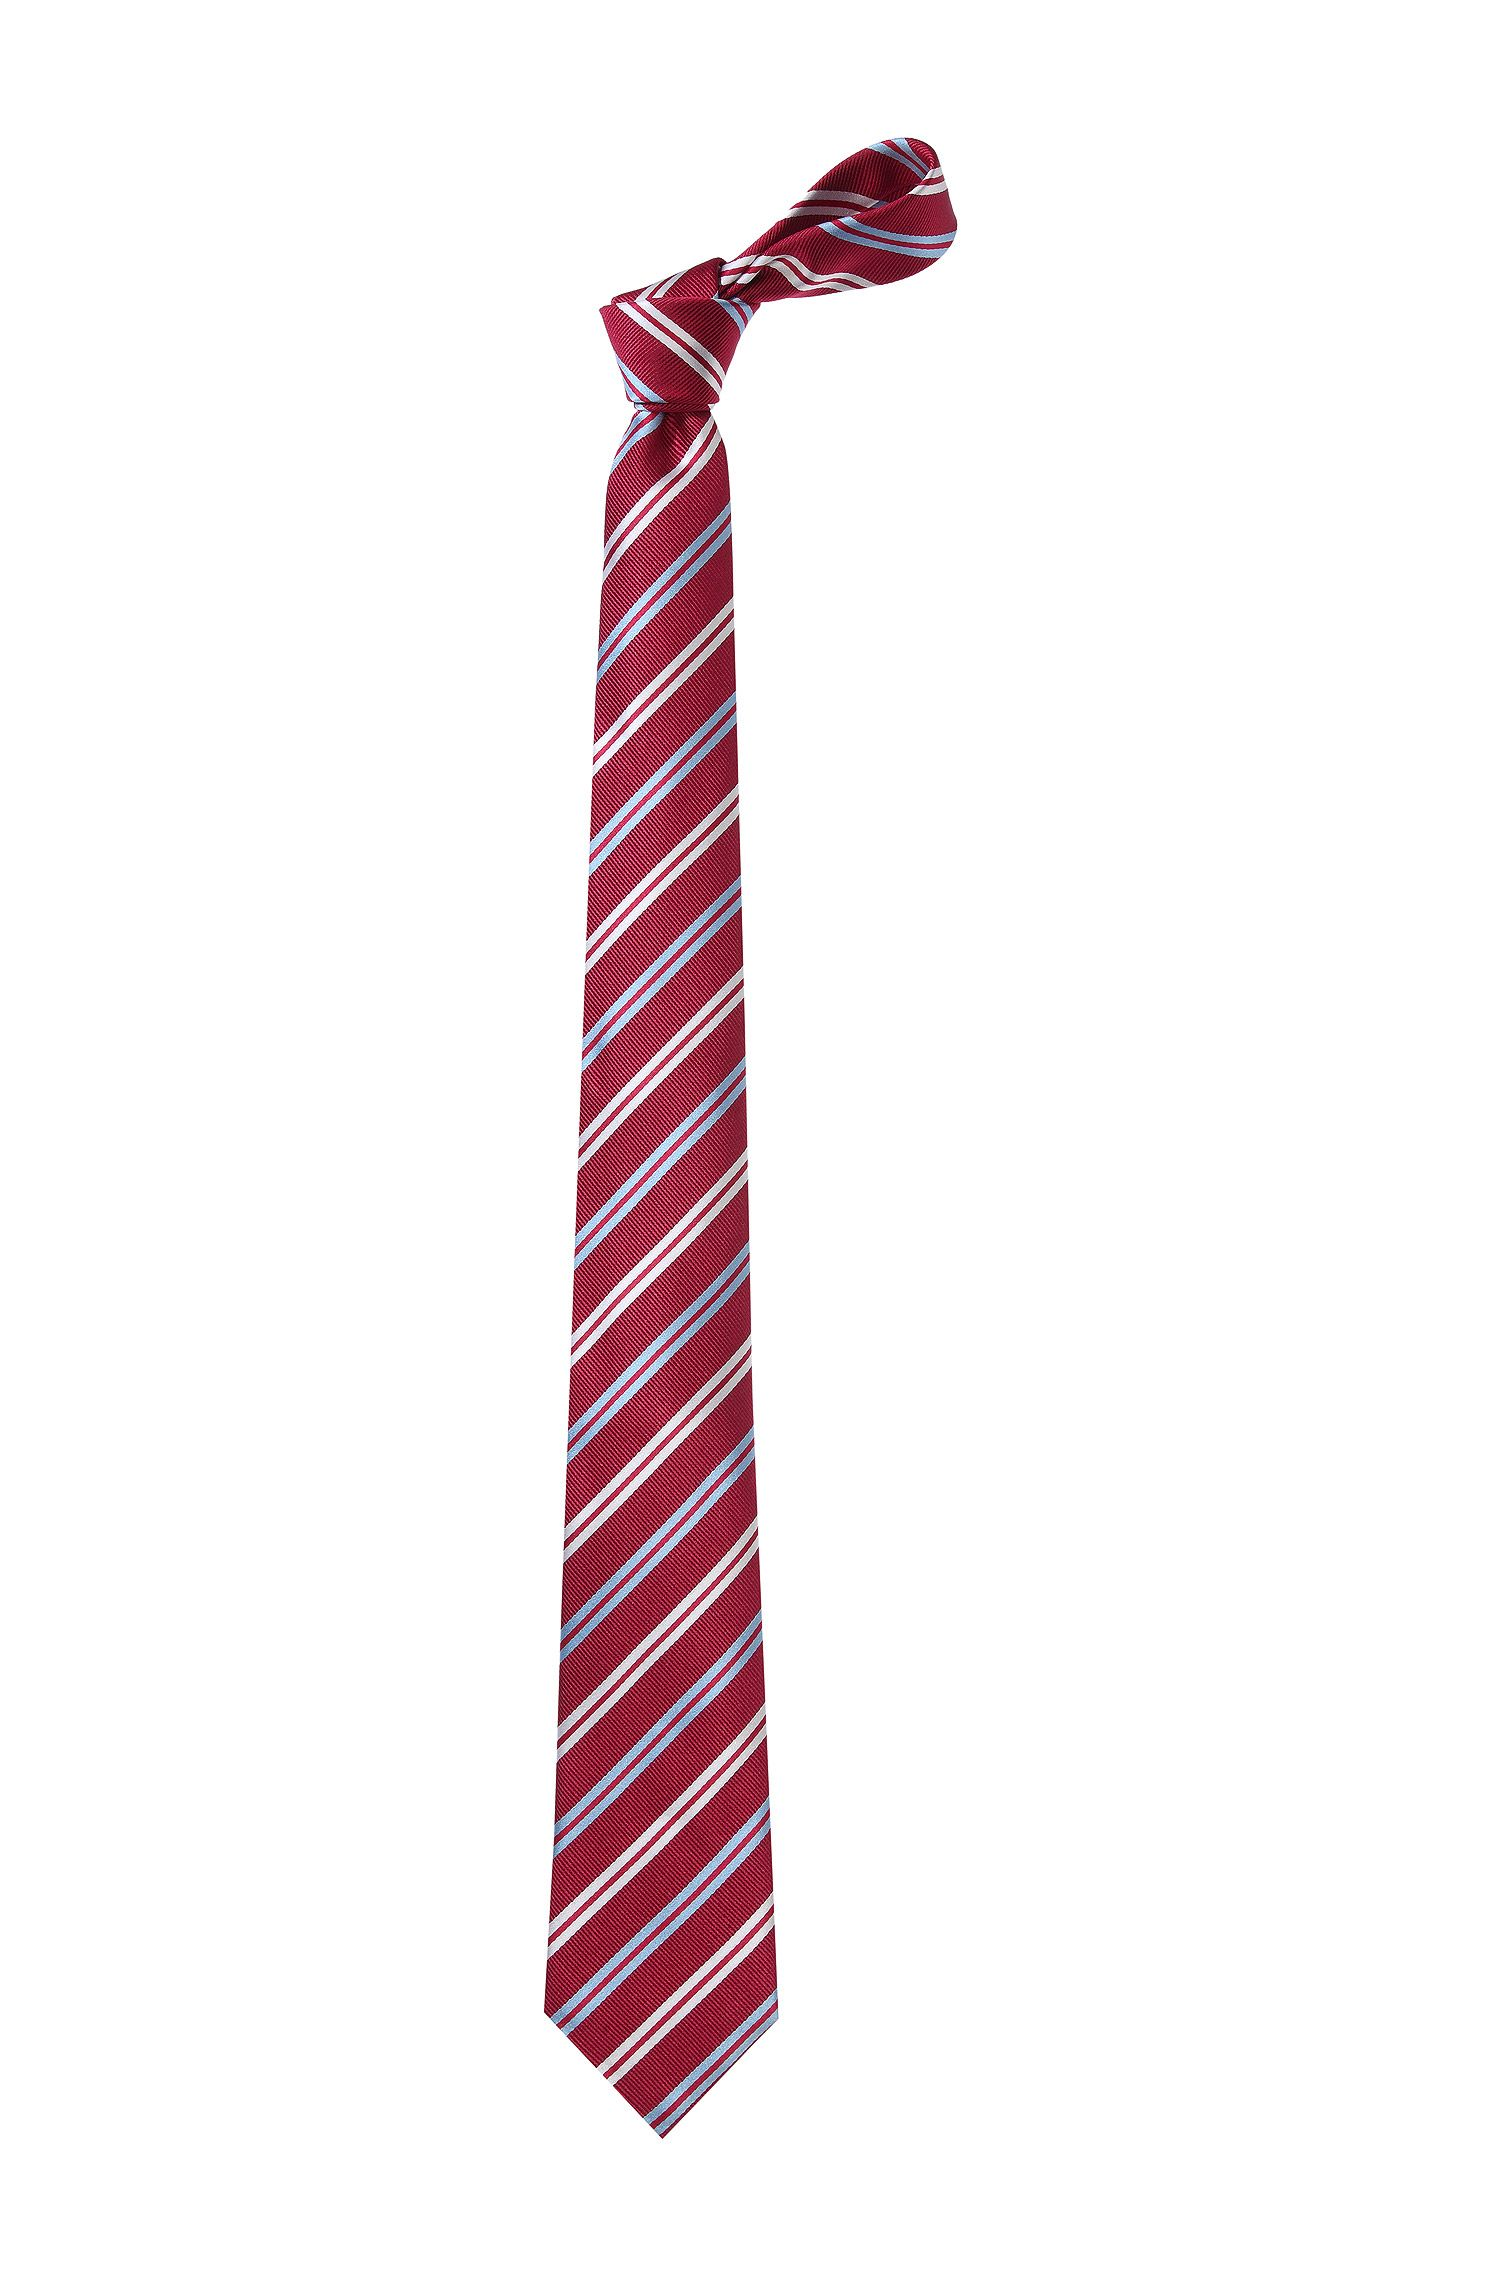 Cravate en soie, Tie 7,5 cm